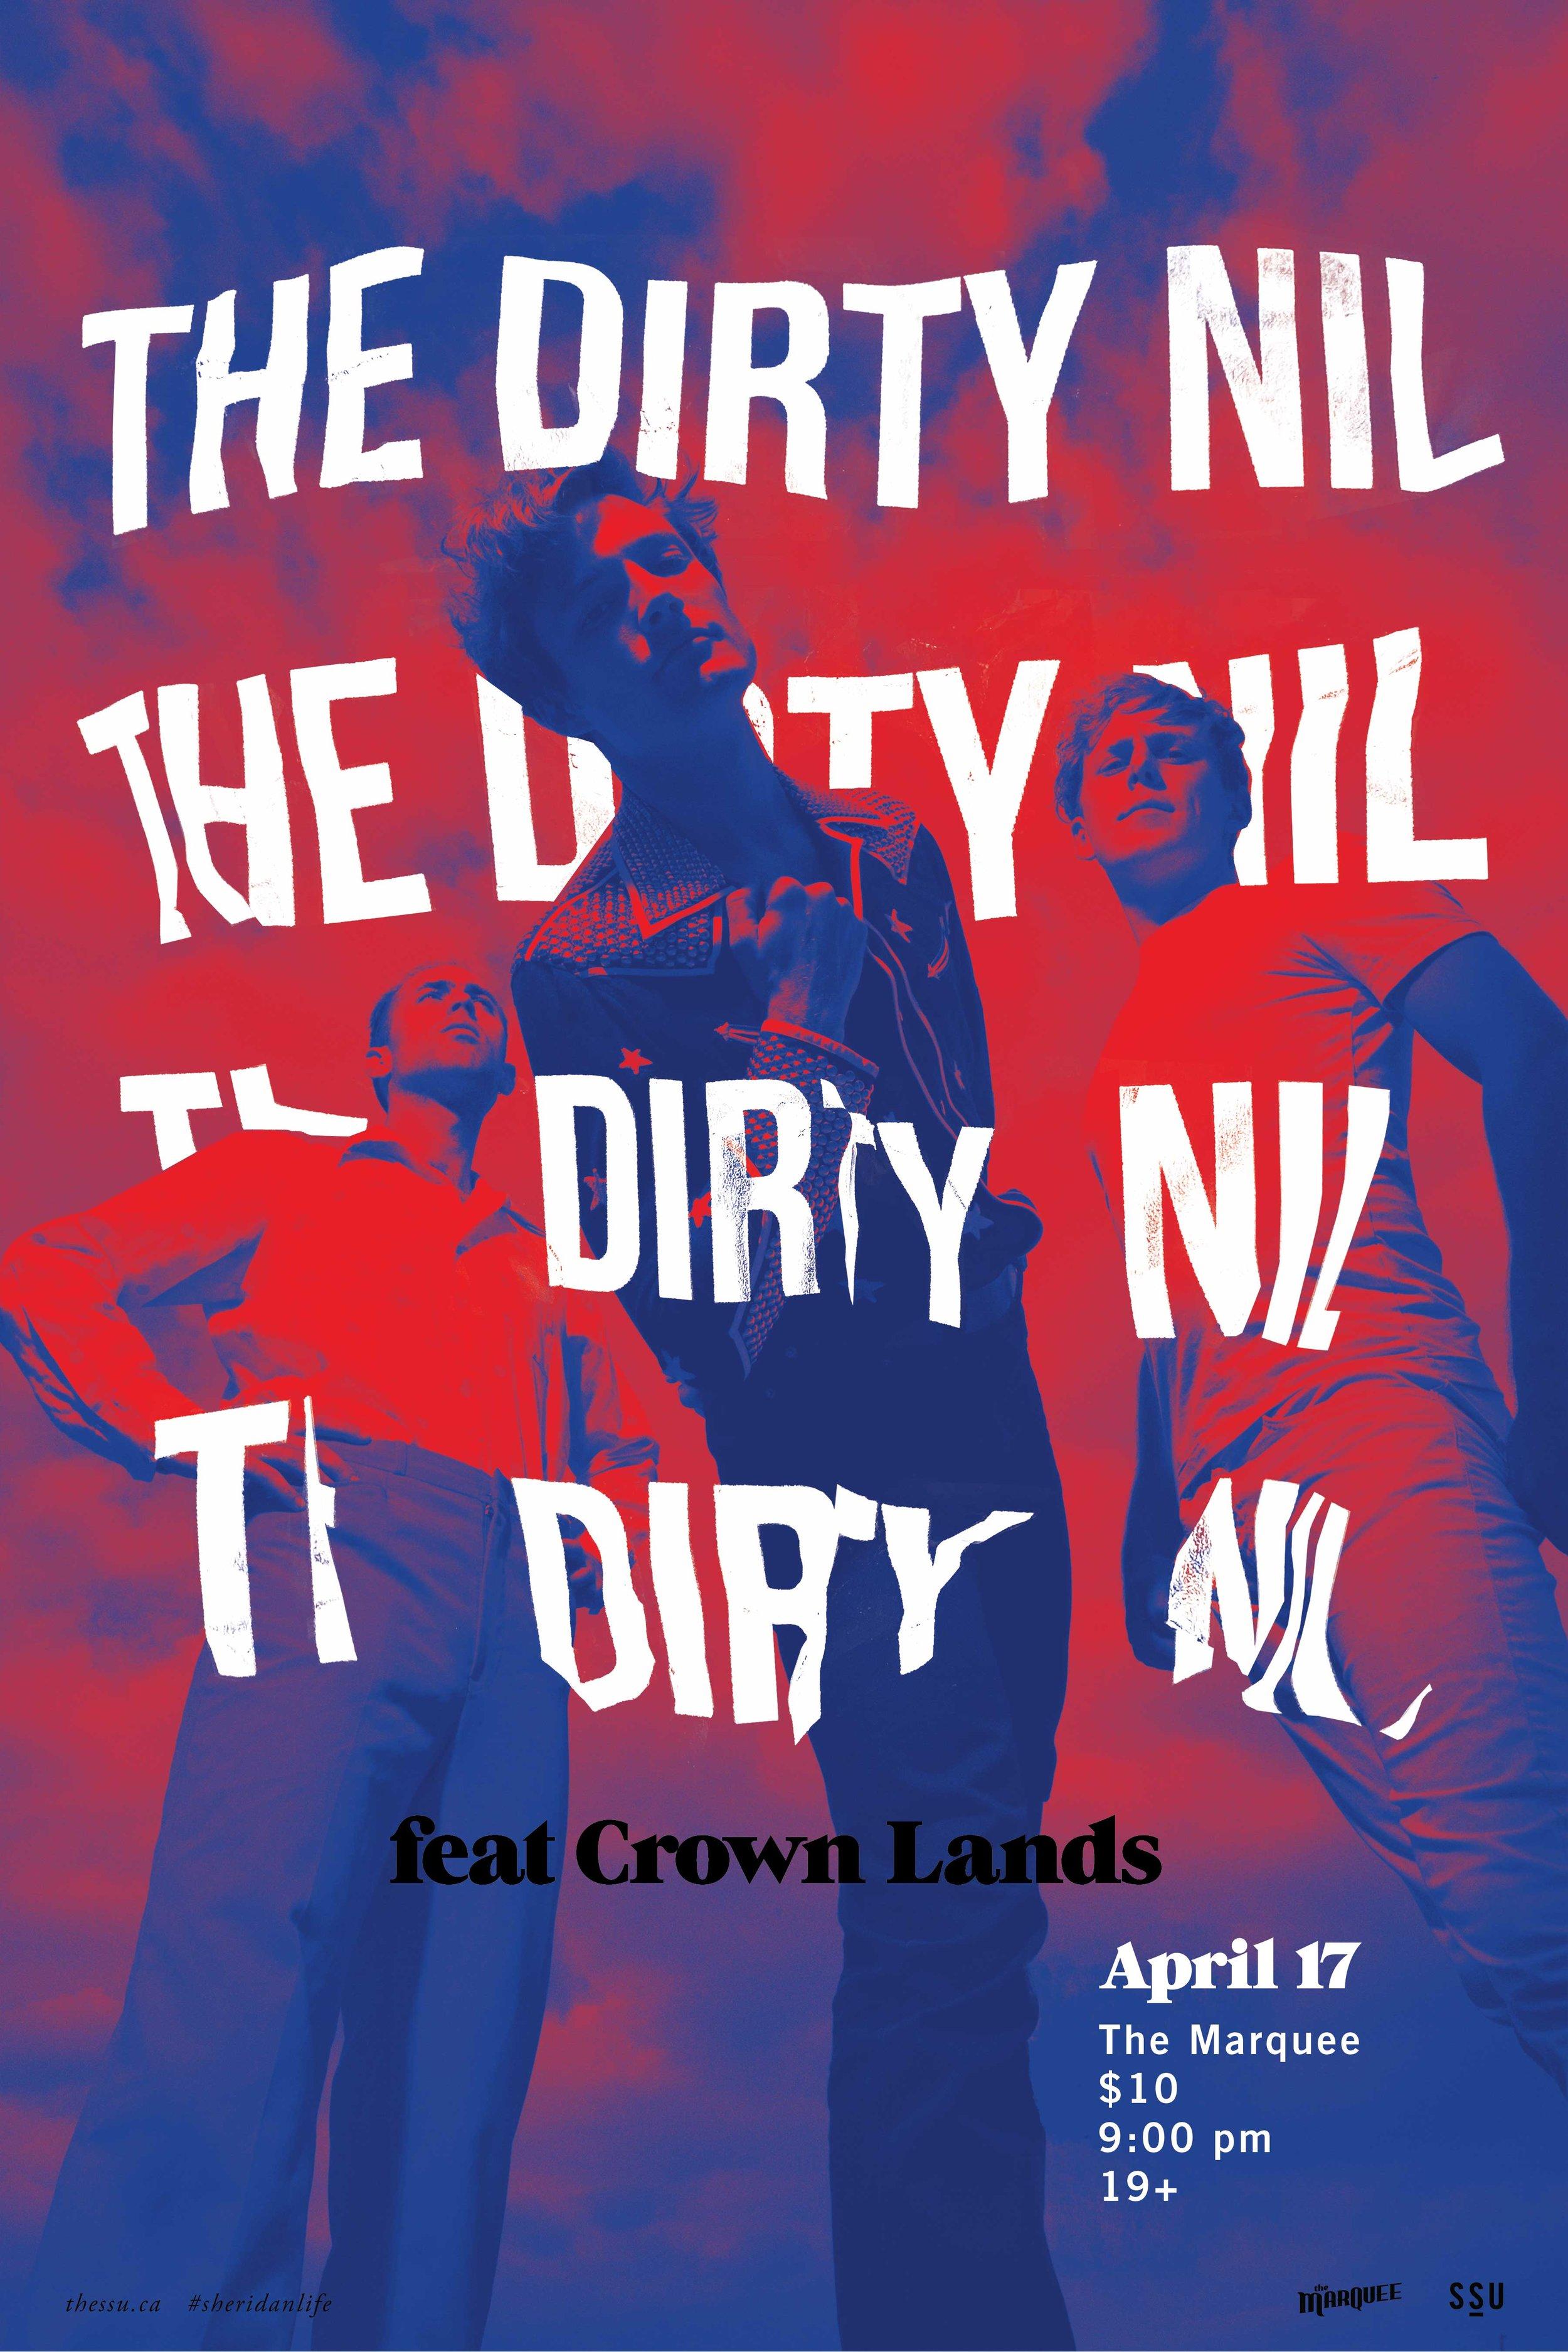 SLR-Dirty-Nil-Feat-Crown-Lands-print-01.jpg